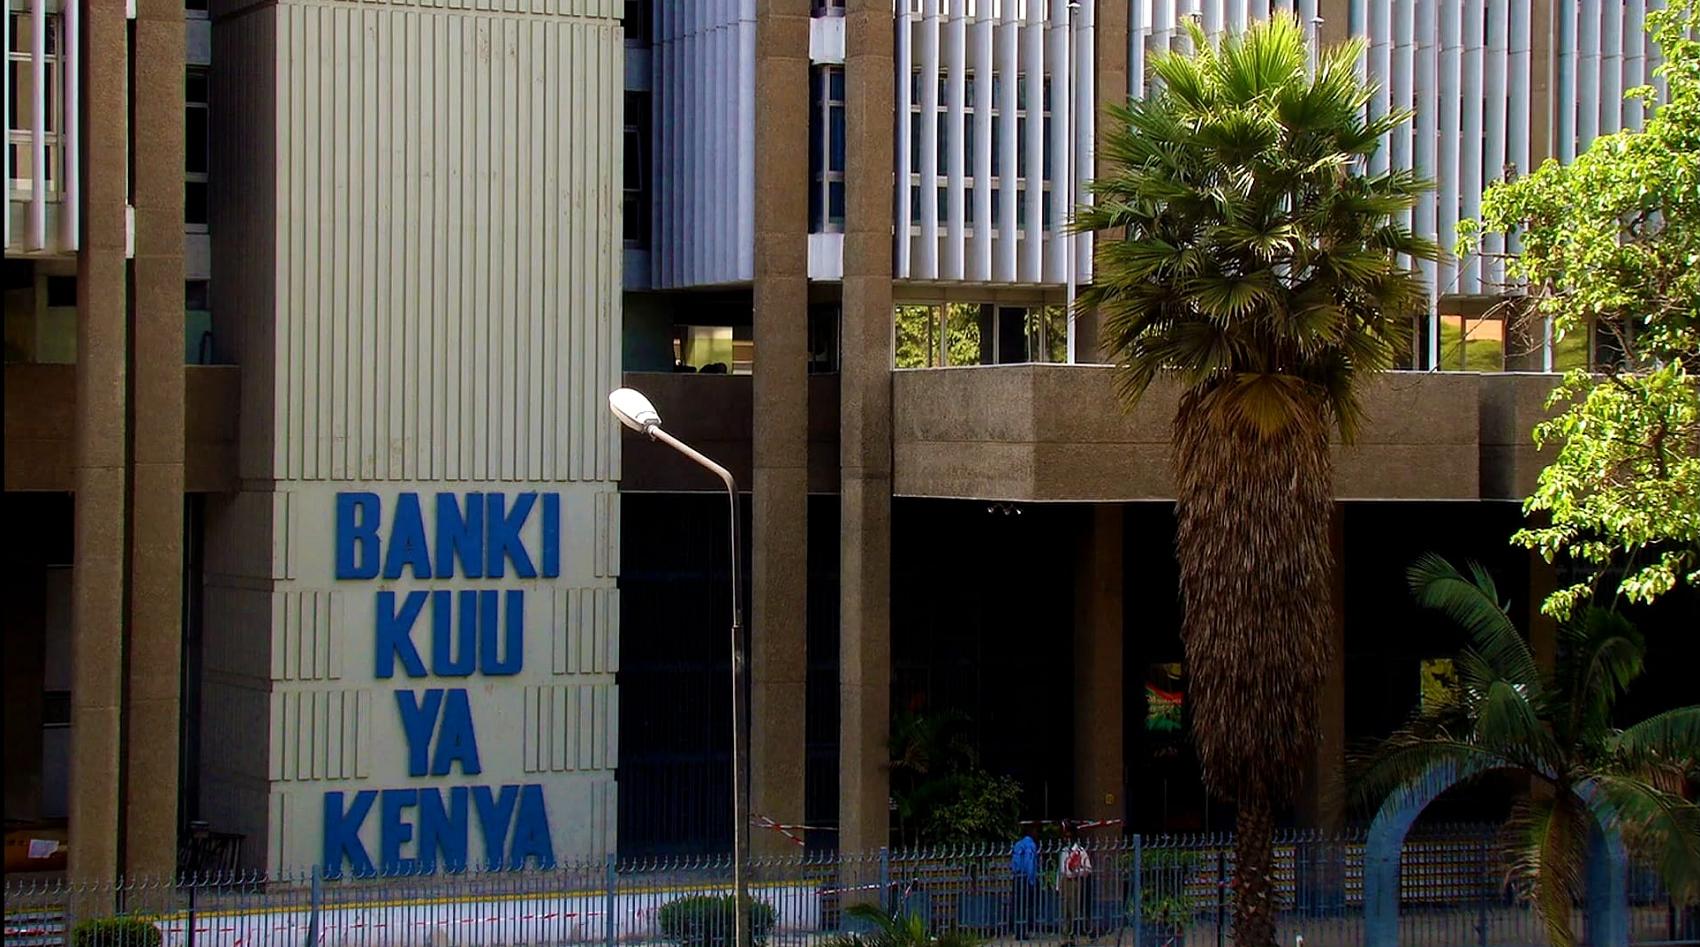 The Central Bank of Kenya (CBK) headquarters in Nairobi.